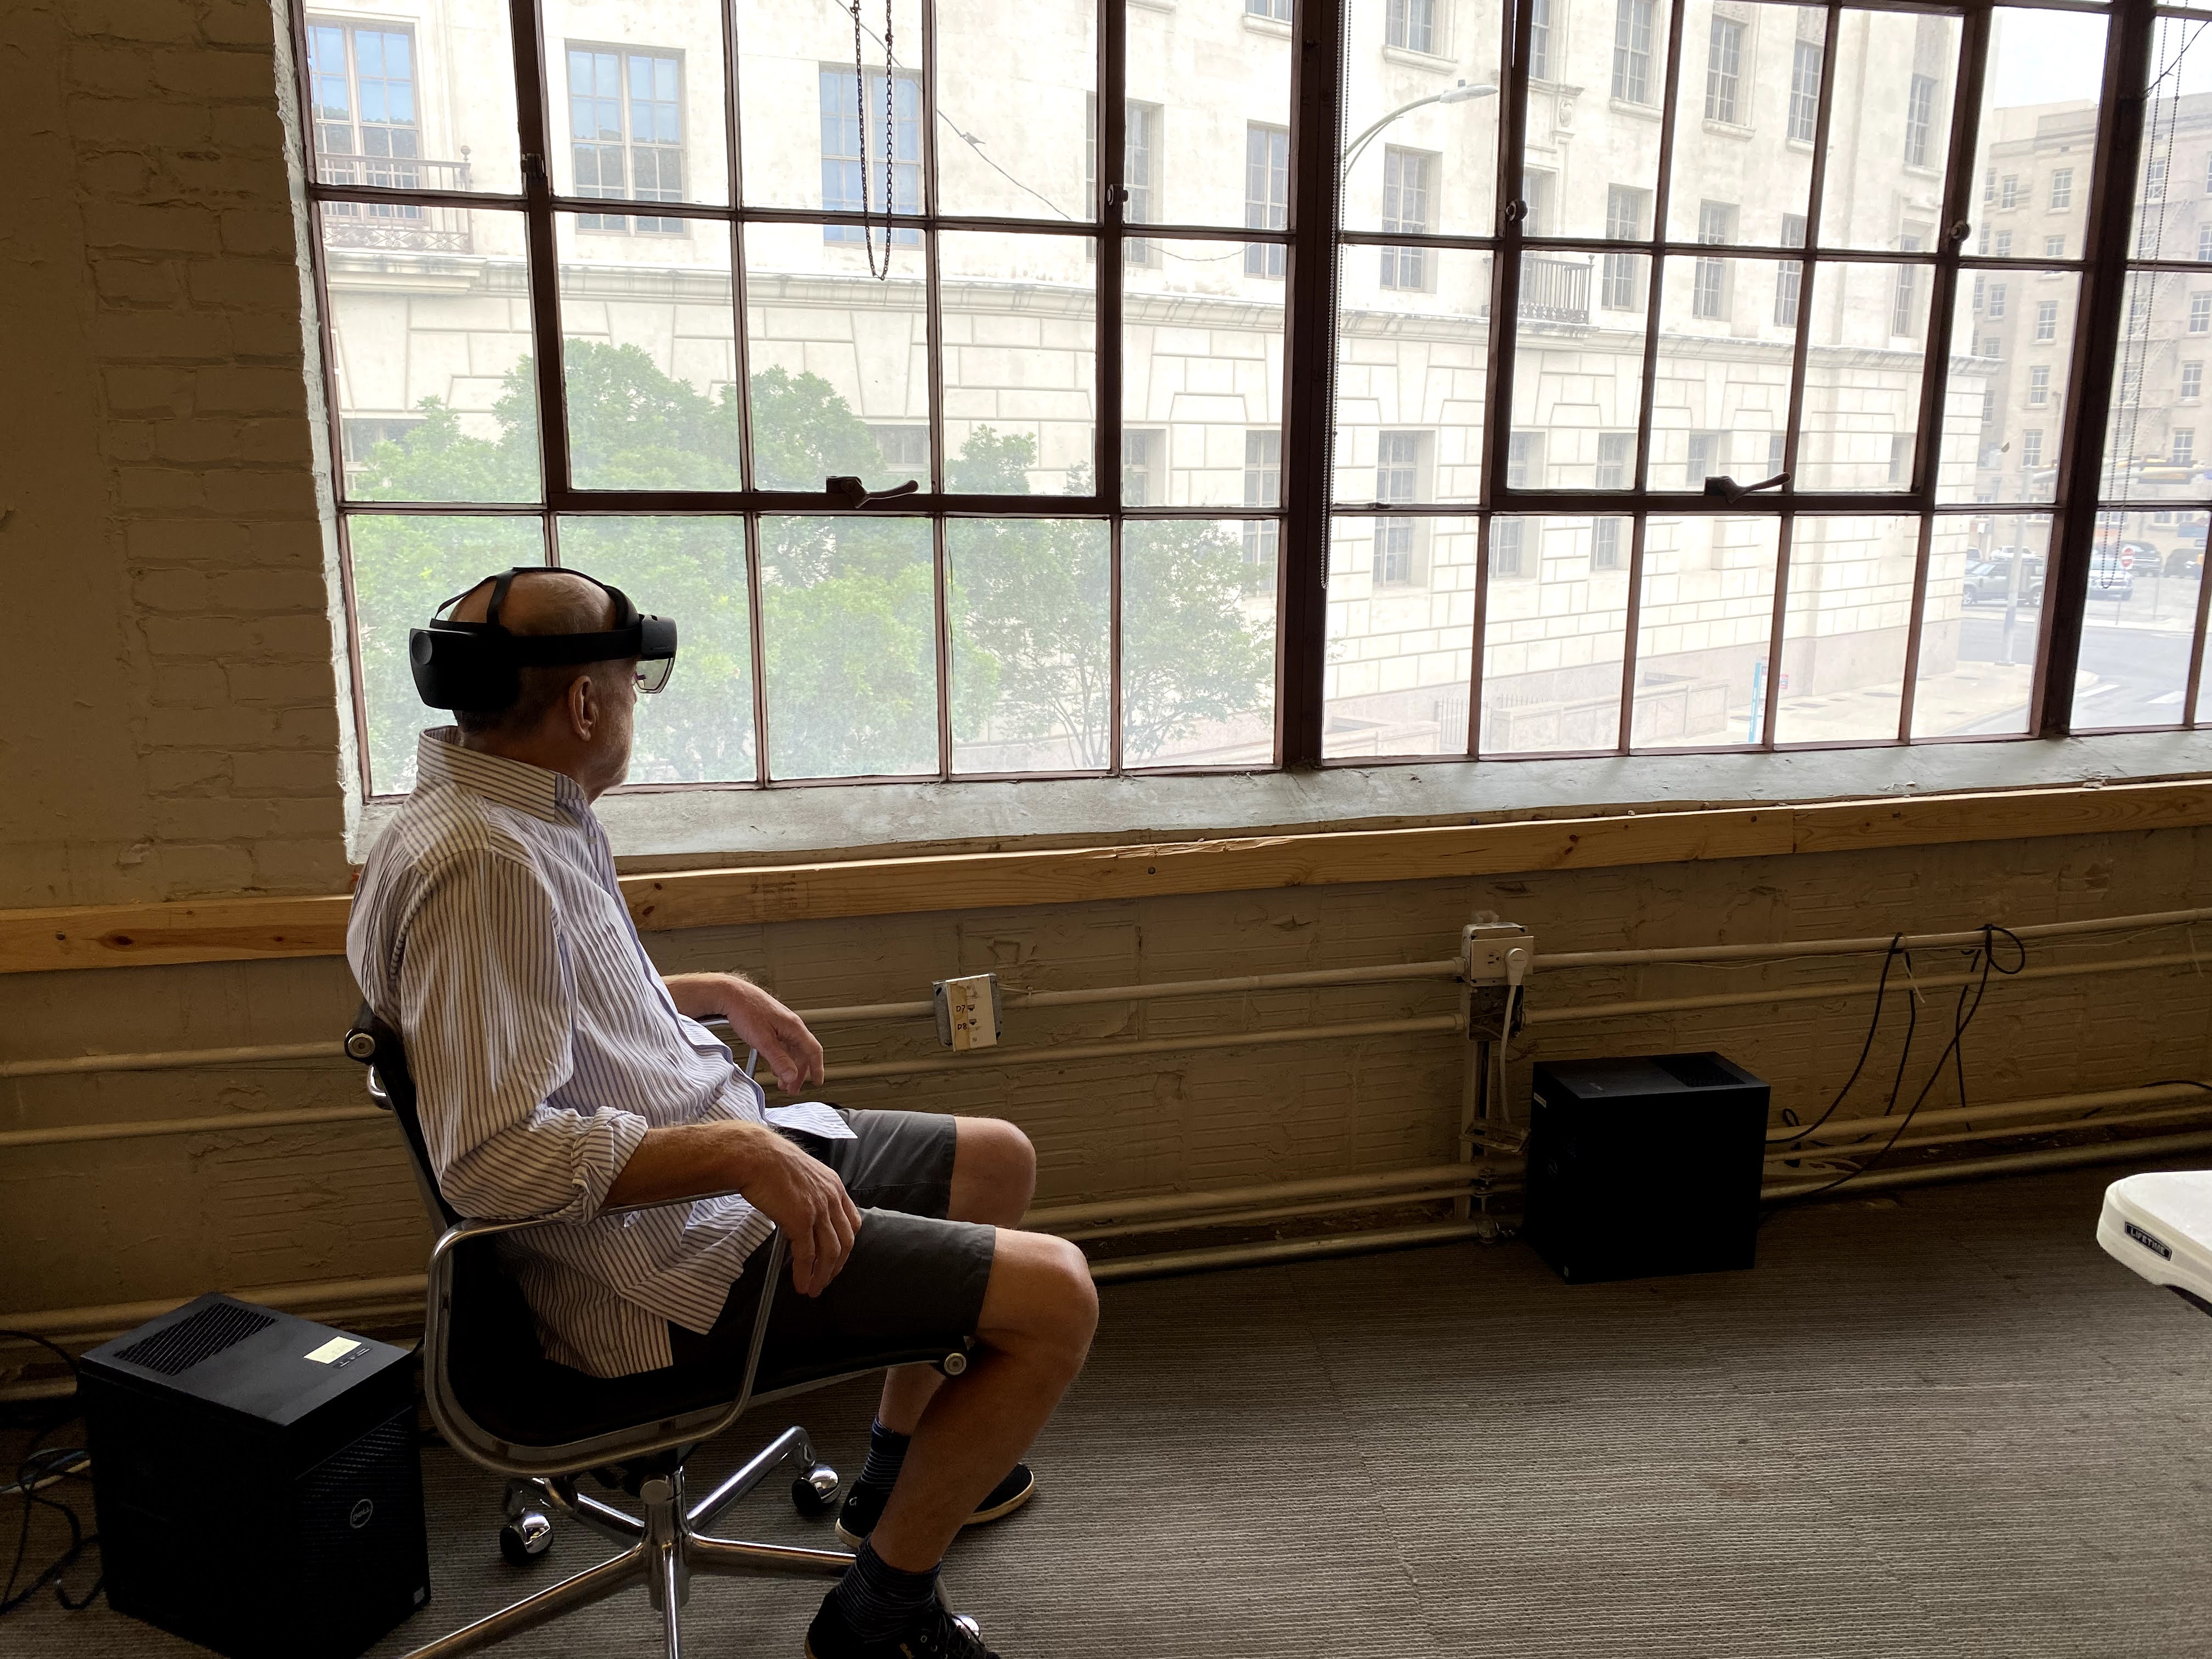 Ted Flato, seated, using Microsoft HoloLens 2